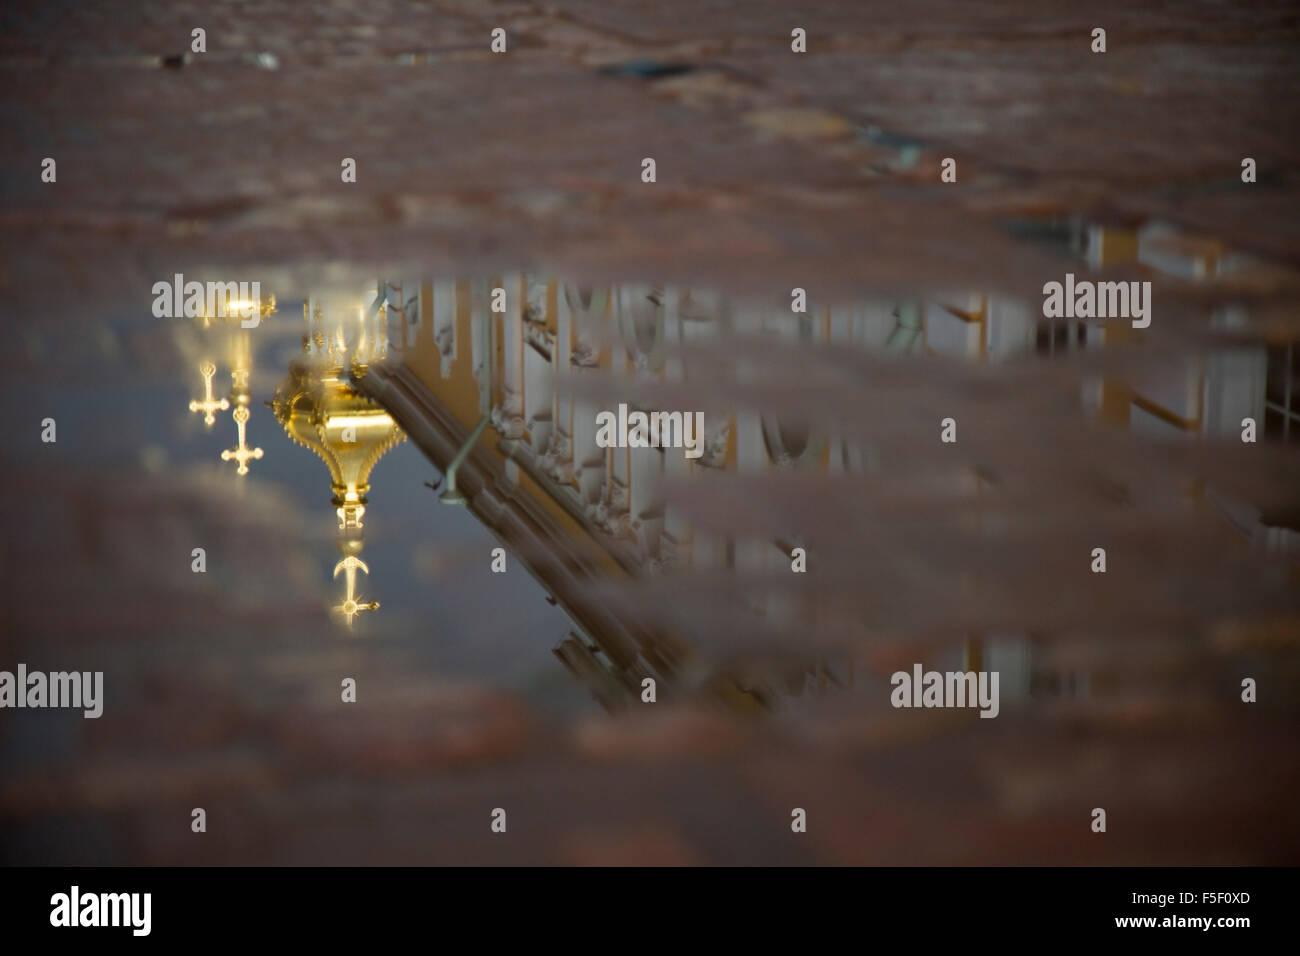 Peterhof Palace Reflexion. - Stock Image